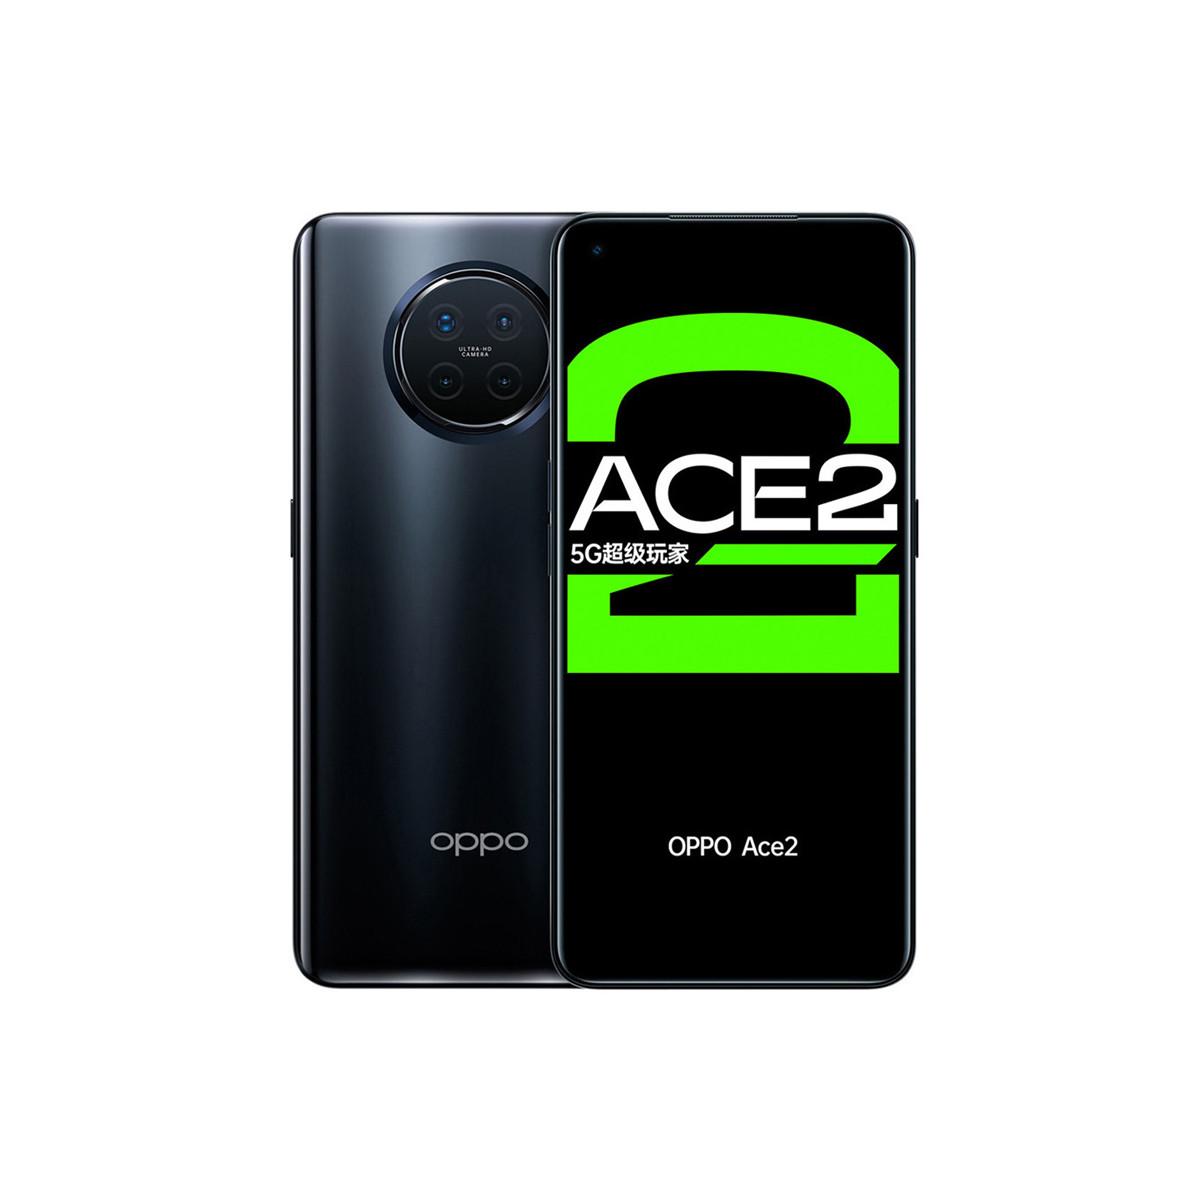 OPPOACE2【无线投屏器套餐】5G手机全网通四摄拍照游戏智能手机Ace2月岩灰套餐B